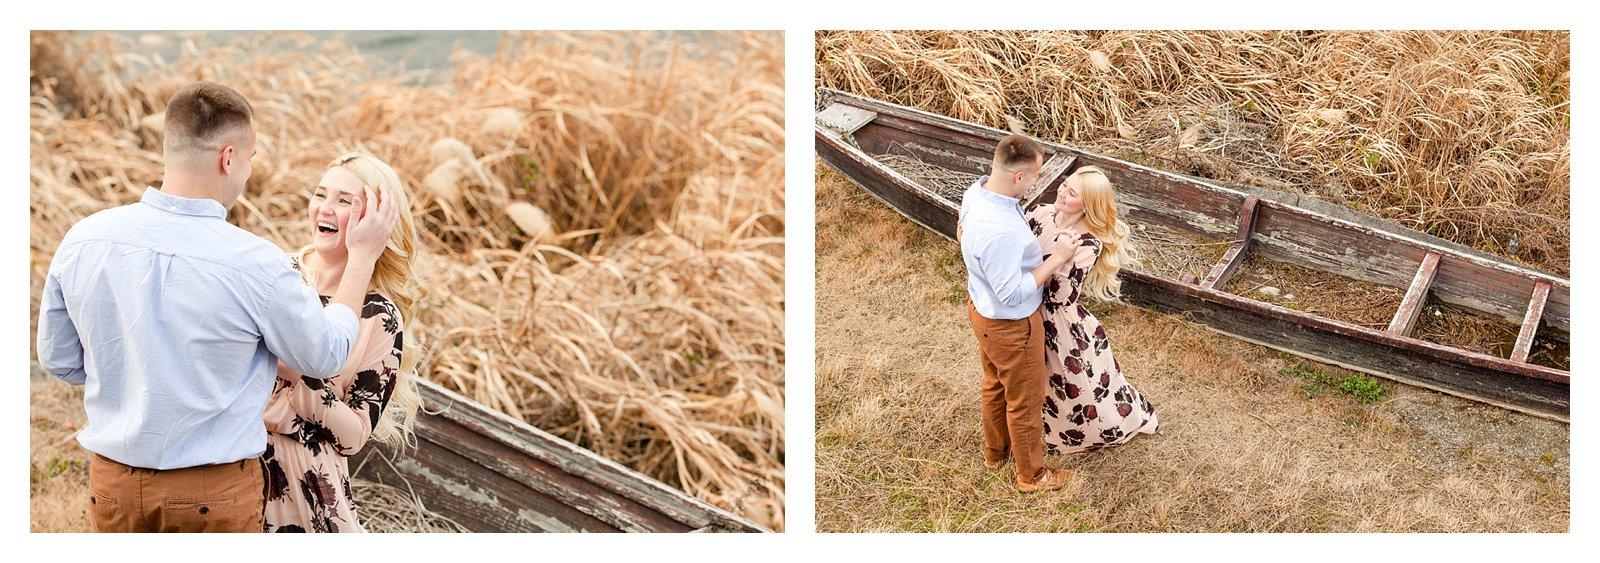 engagement_photos_photographer_Saint_Louis_MO_Kansas_City_Missouri_Springfield_Lake_Ozark_Scenic_Destination_Videography_Videographer_0330.jpg